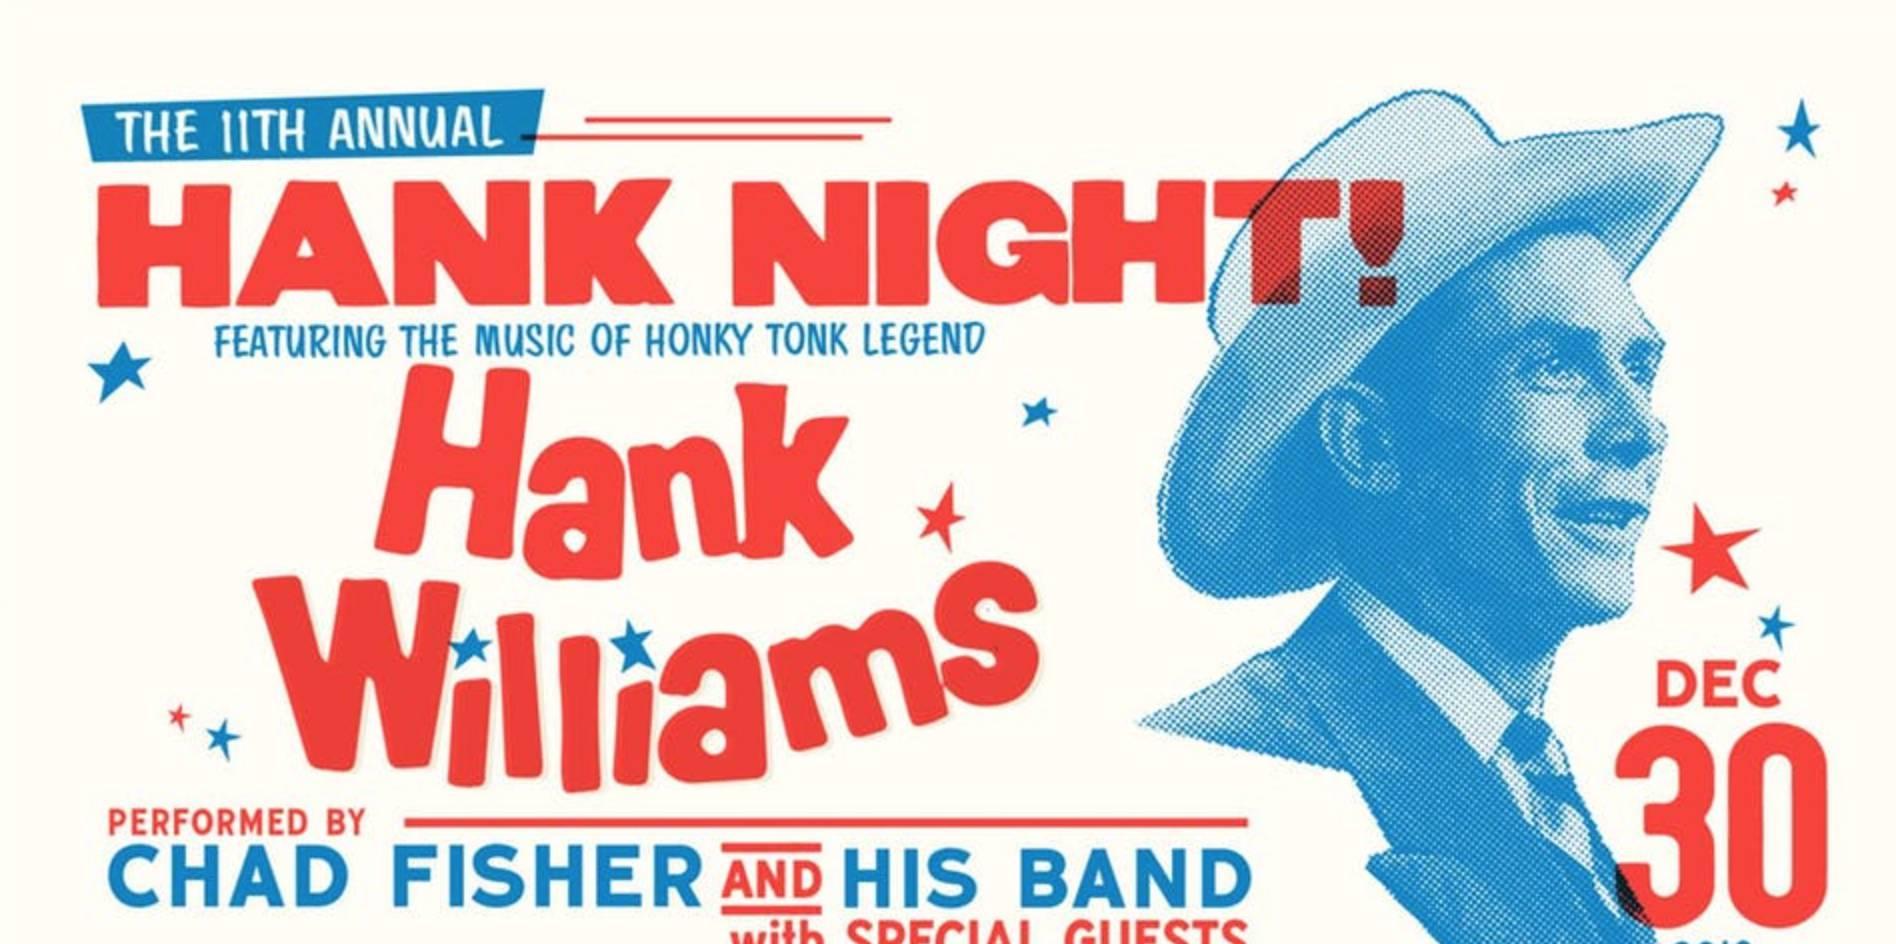 The 11th Annual Hank Night